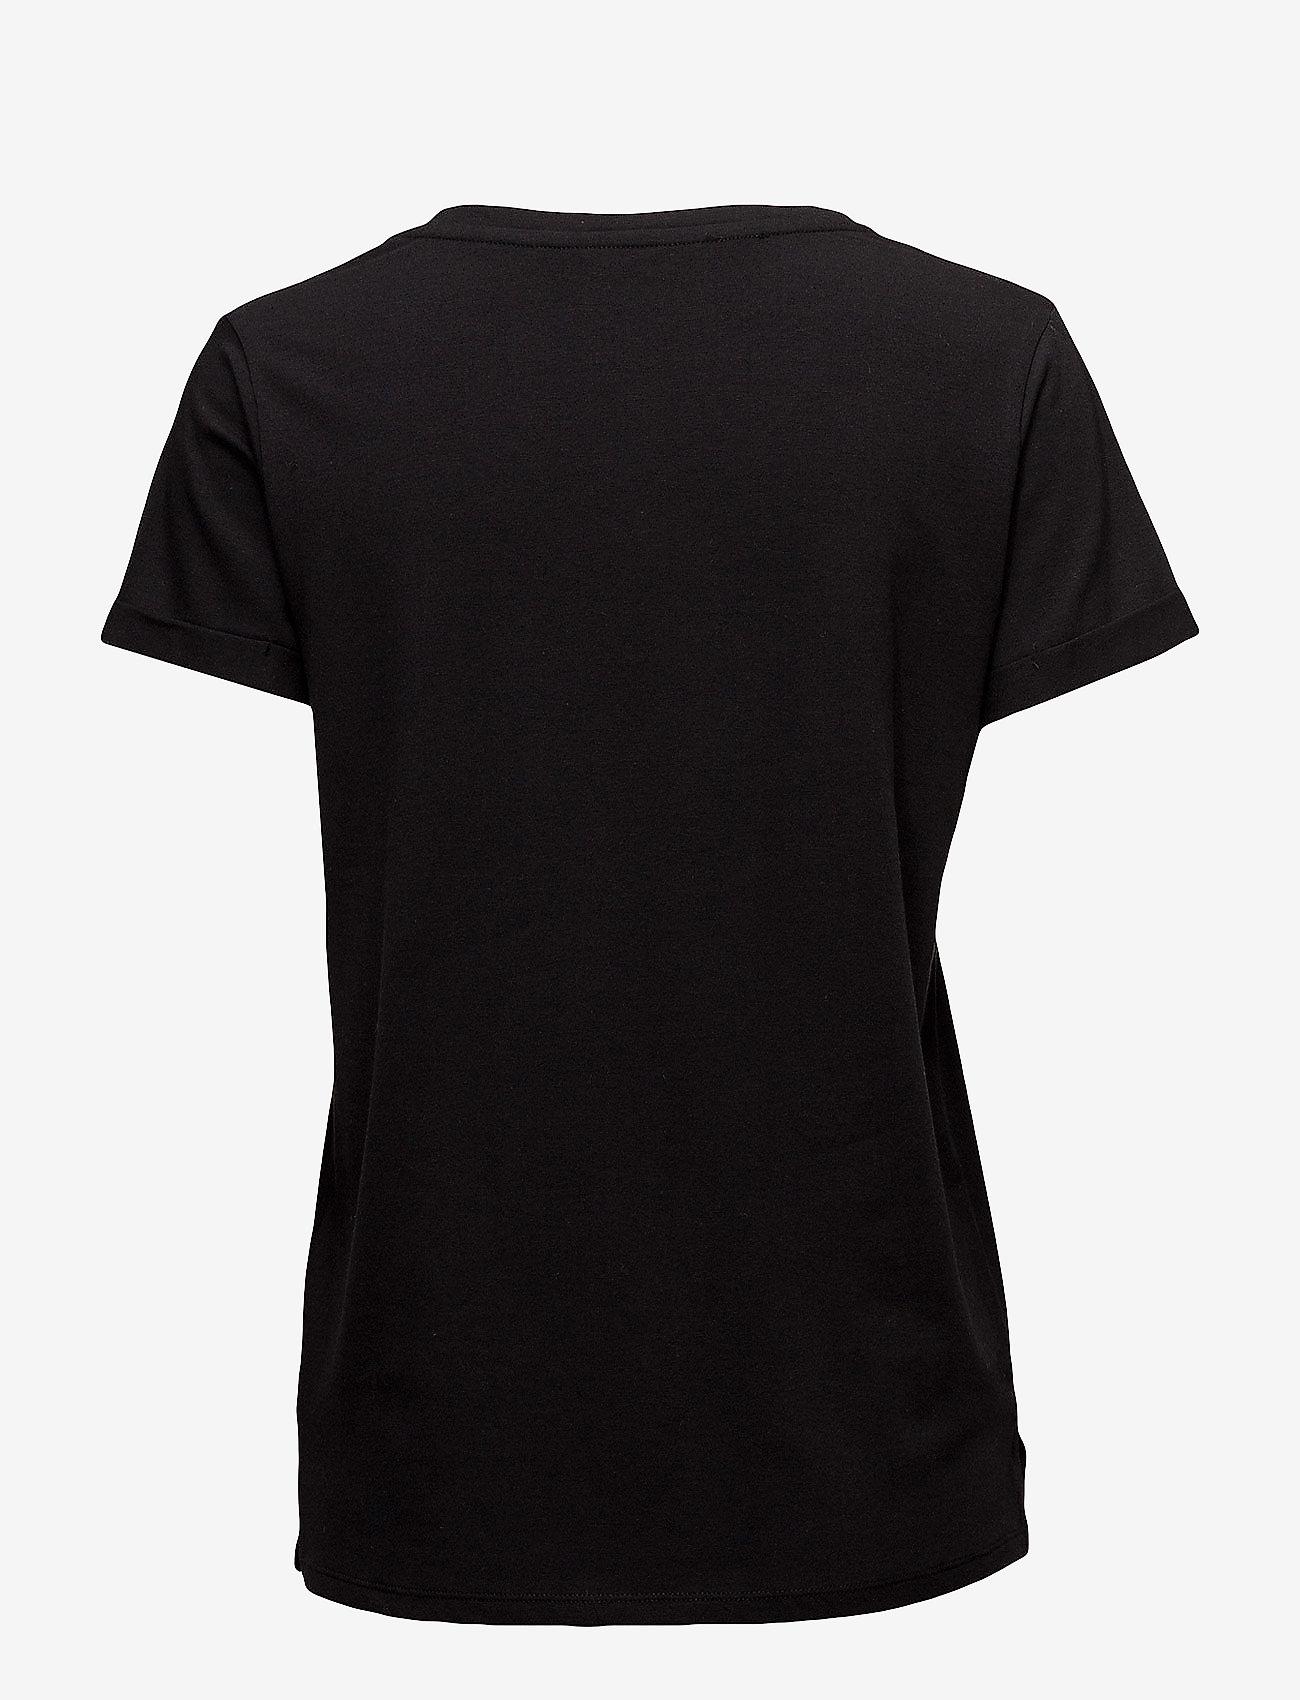 Minus - Adele tee - t-shirts - black - 1